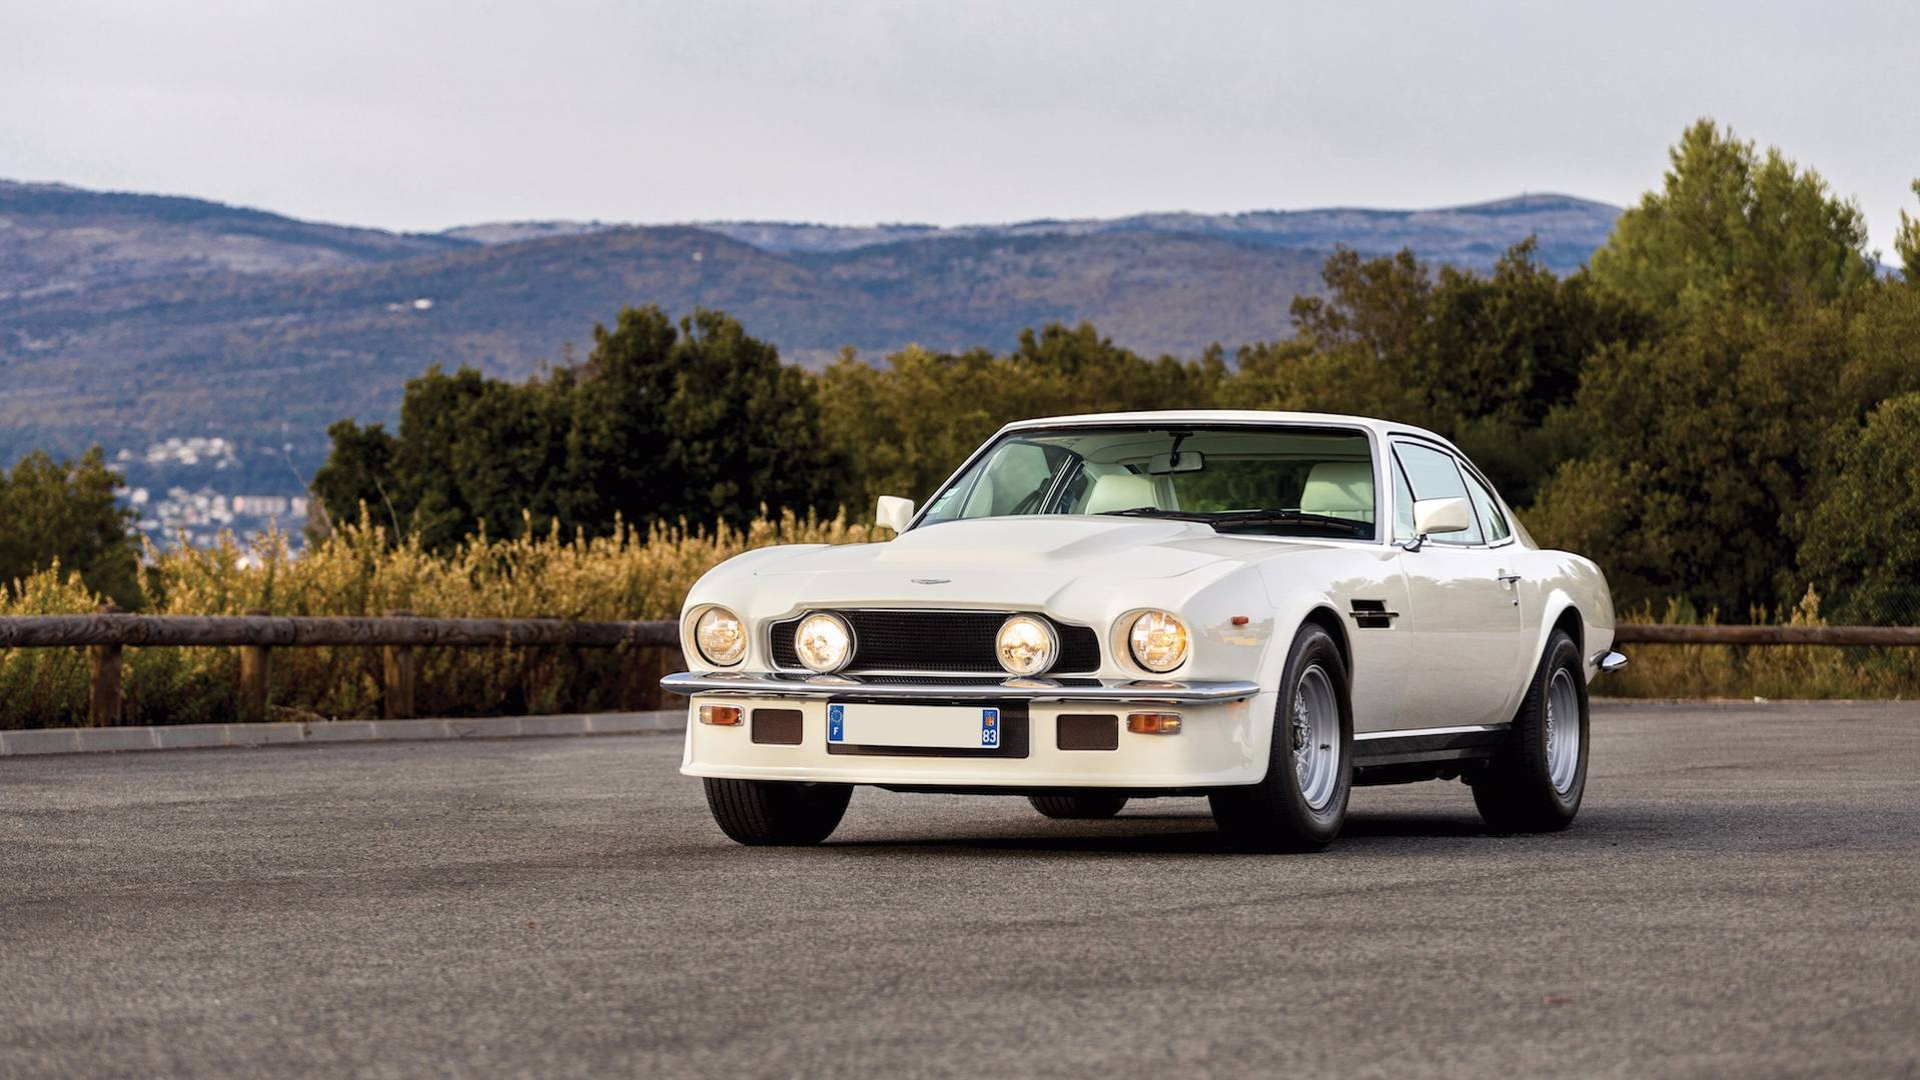 Auction Bound Aston Martin V8 Vantage Oscar India One Of Just 41